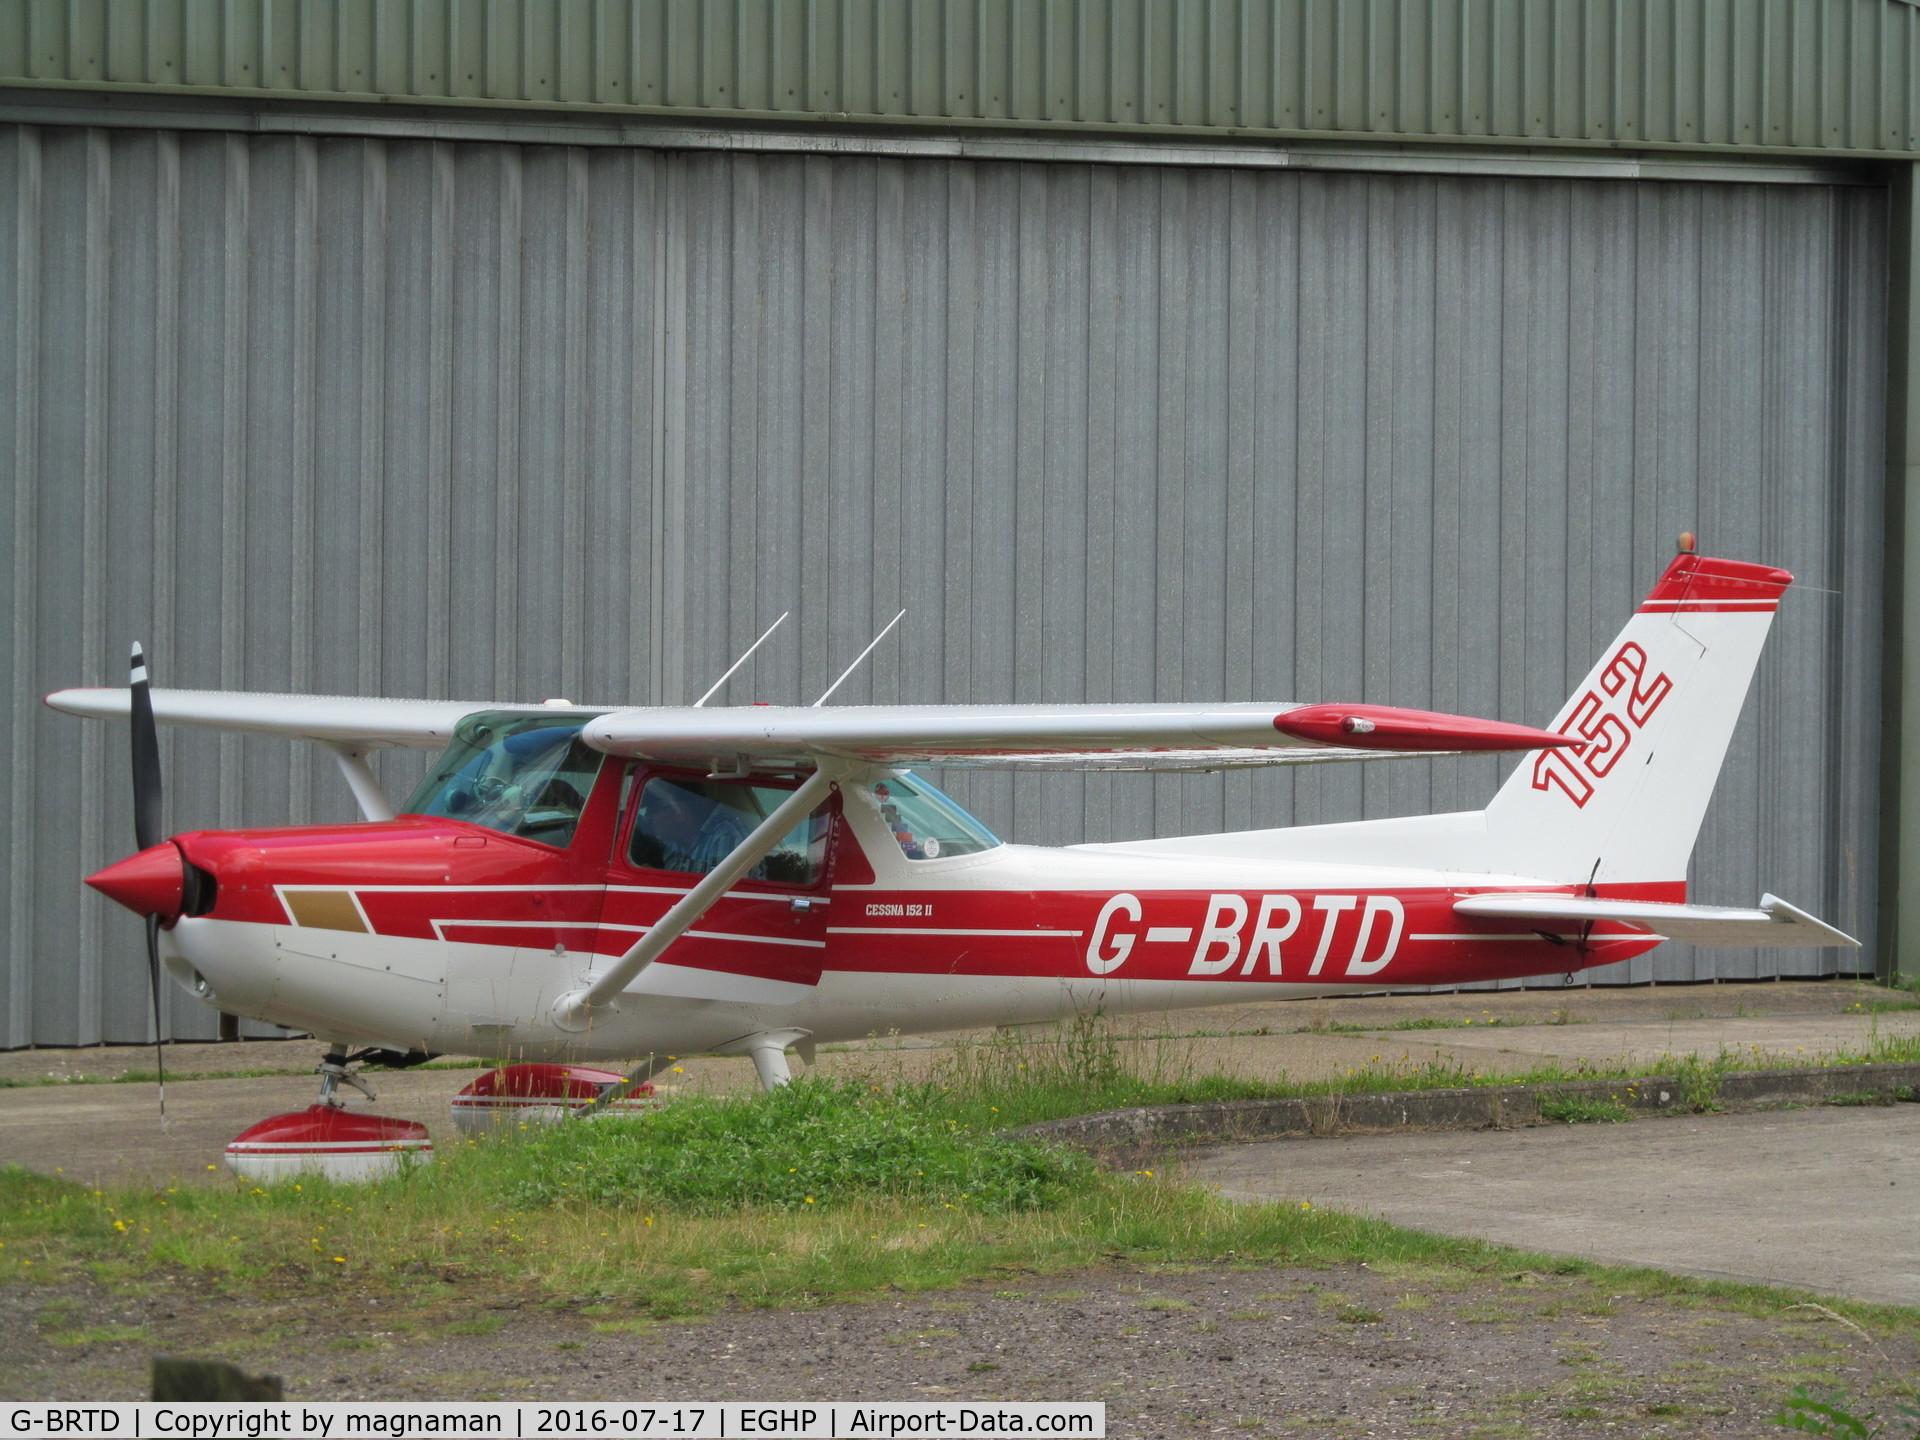 G-BRTD, 1977 Cessna 152 C/N 152-80023, just landed